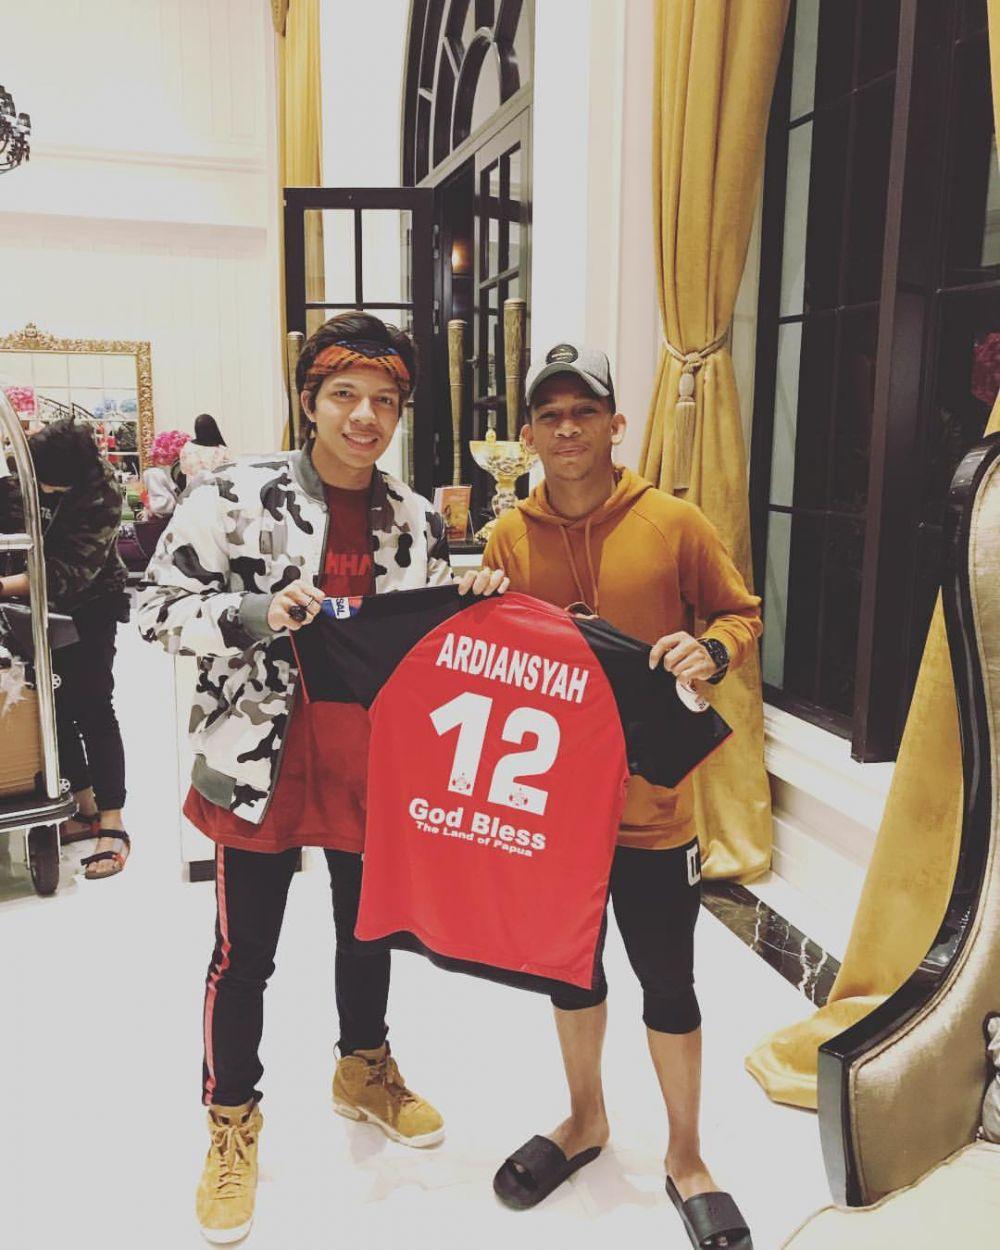 10 Potret Ardiansyah Runtuboy, Bintang Timnas Futsal Indonesia